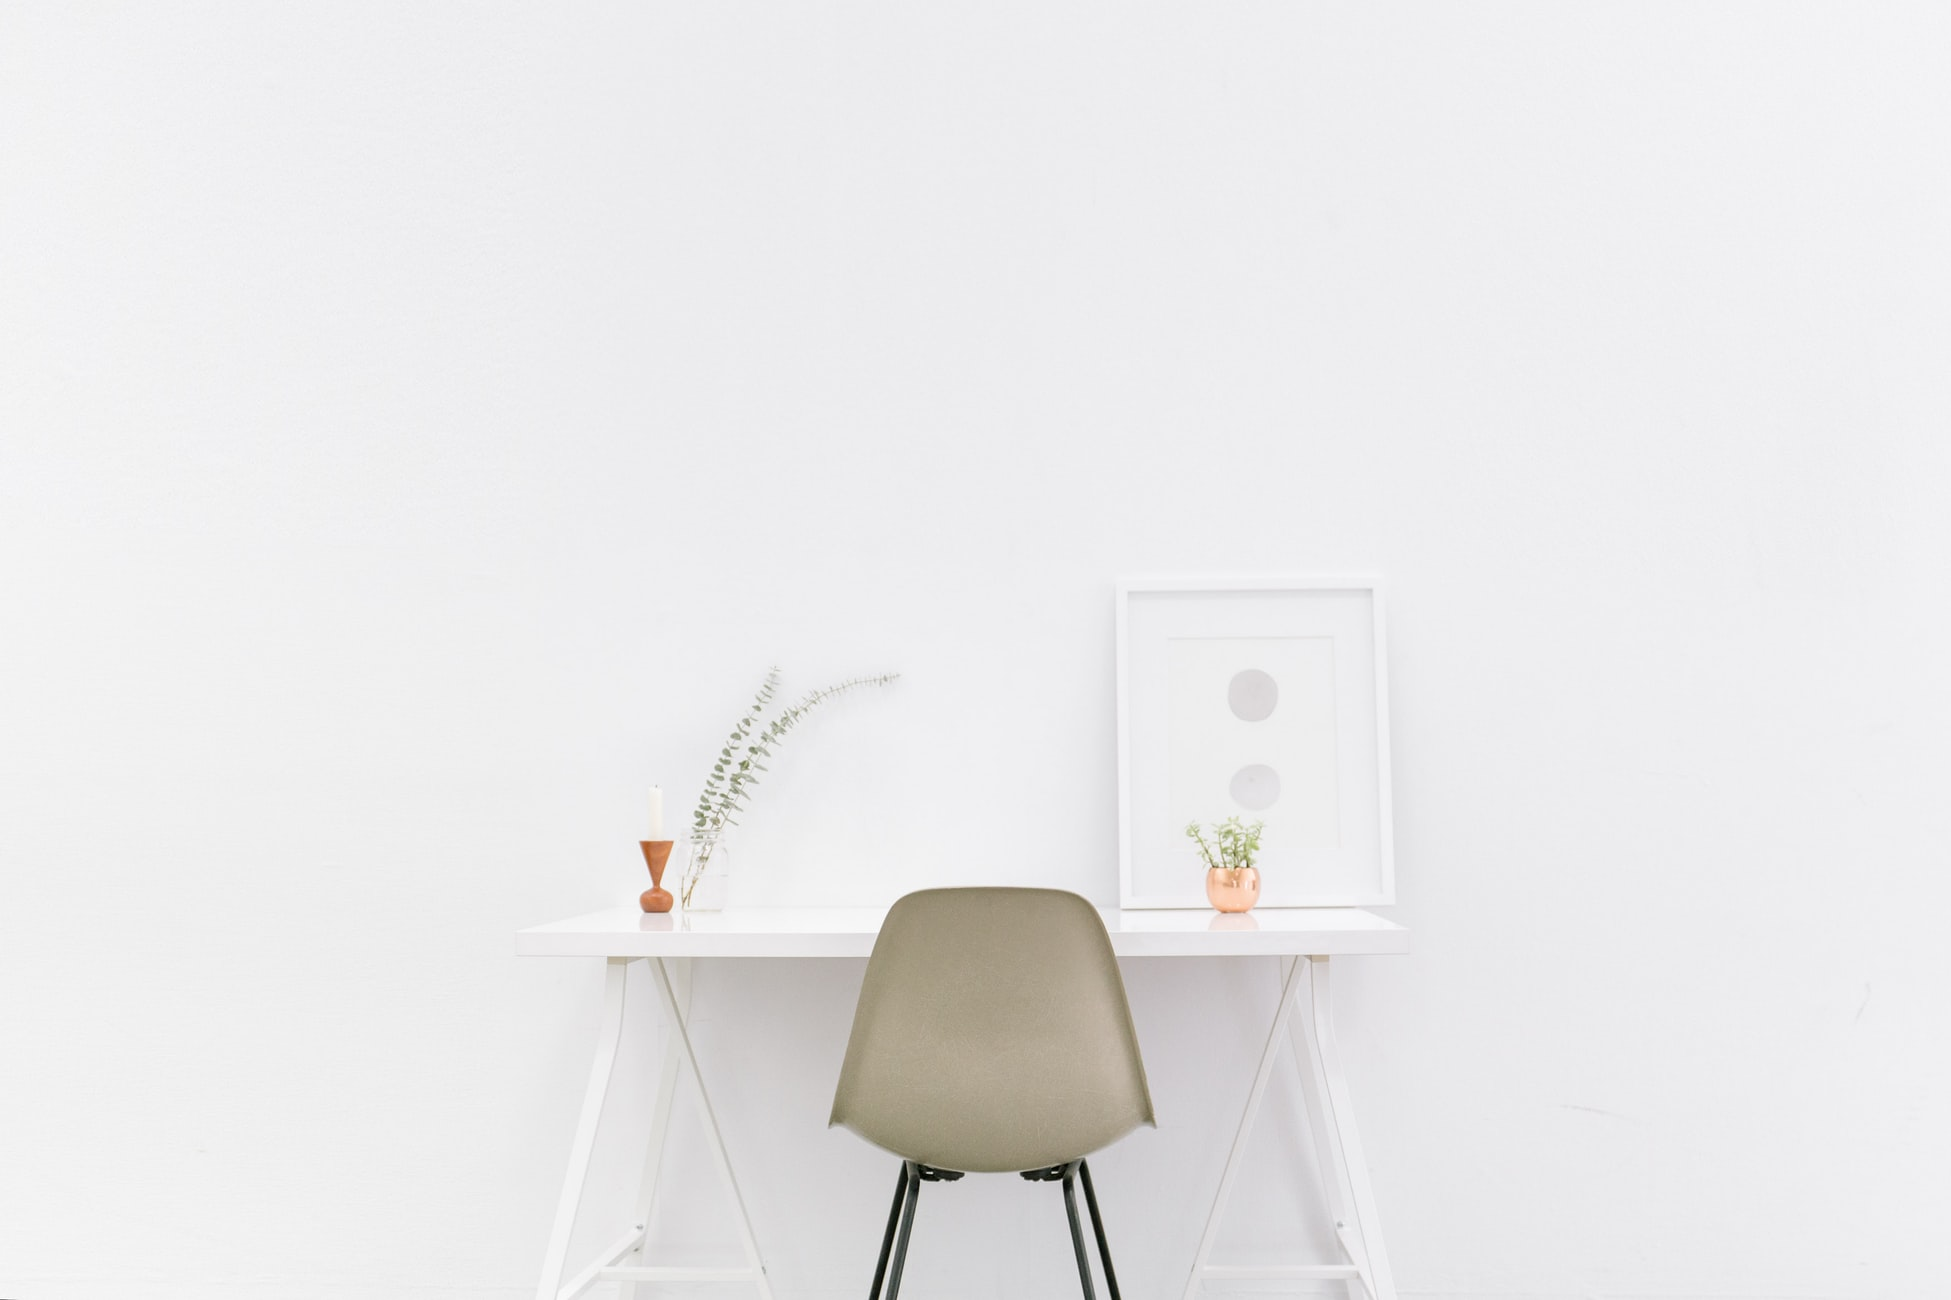 Furniture in a small rental